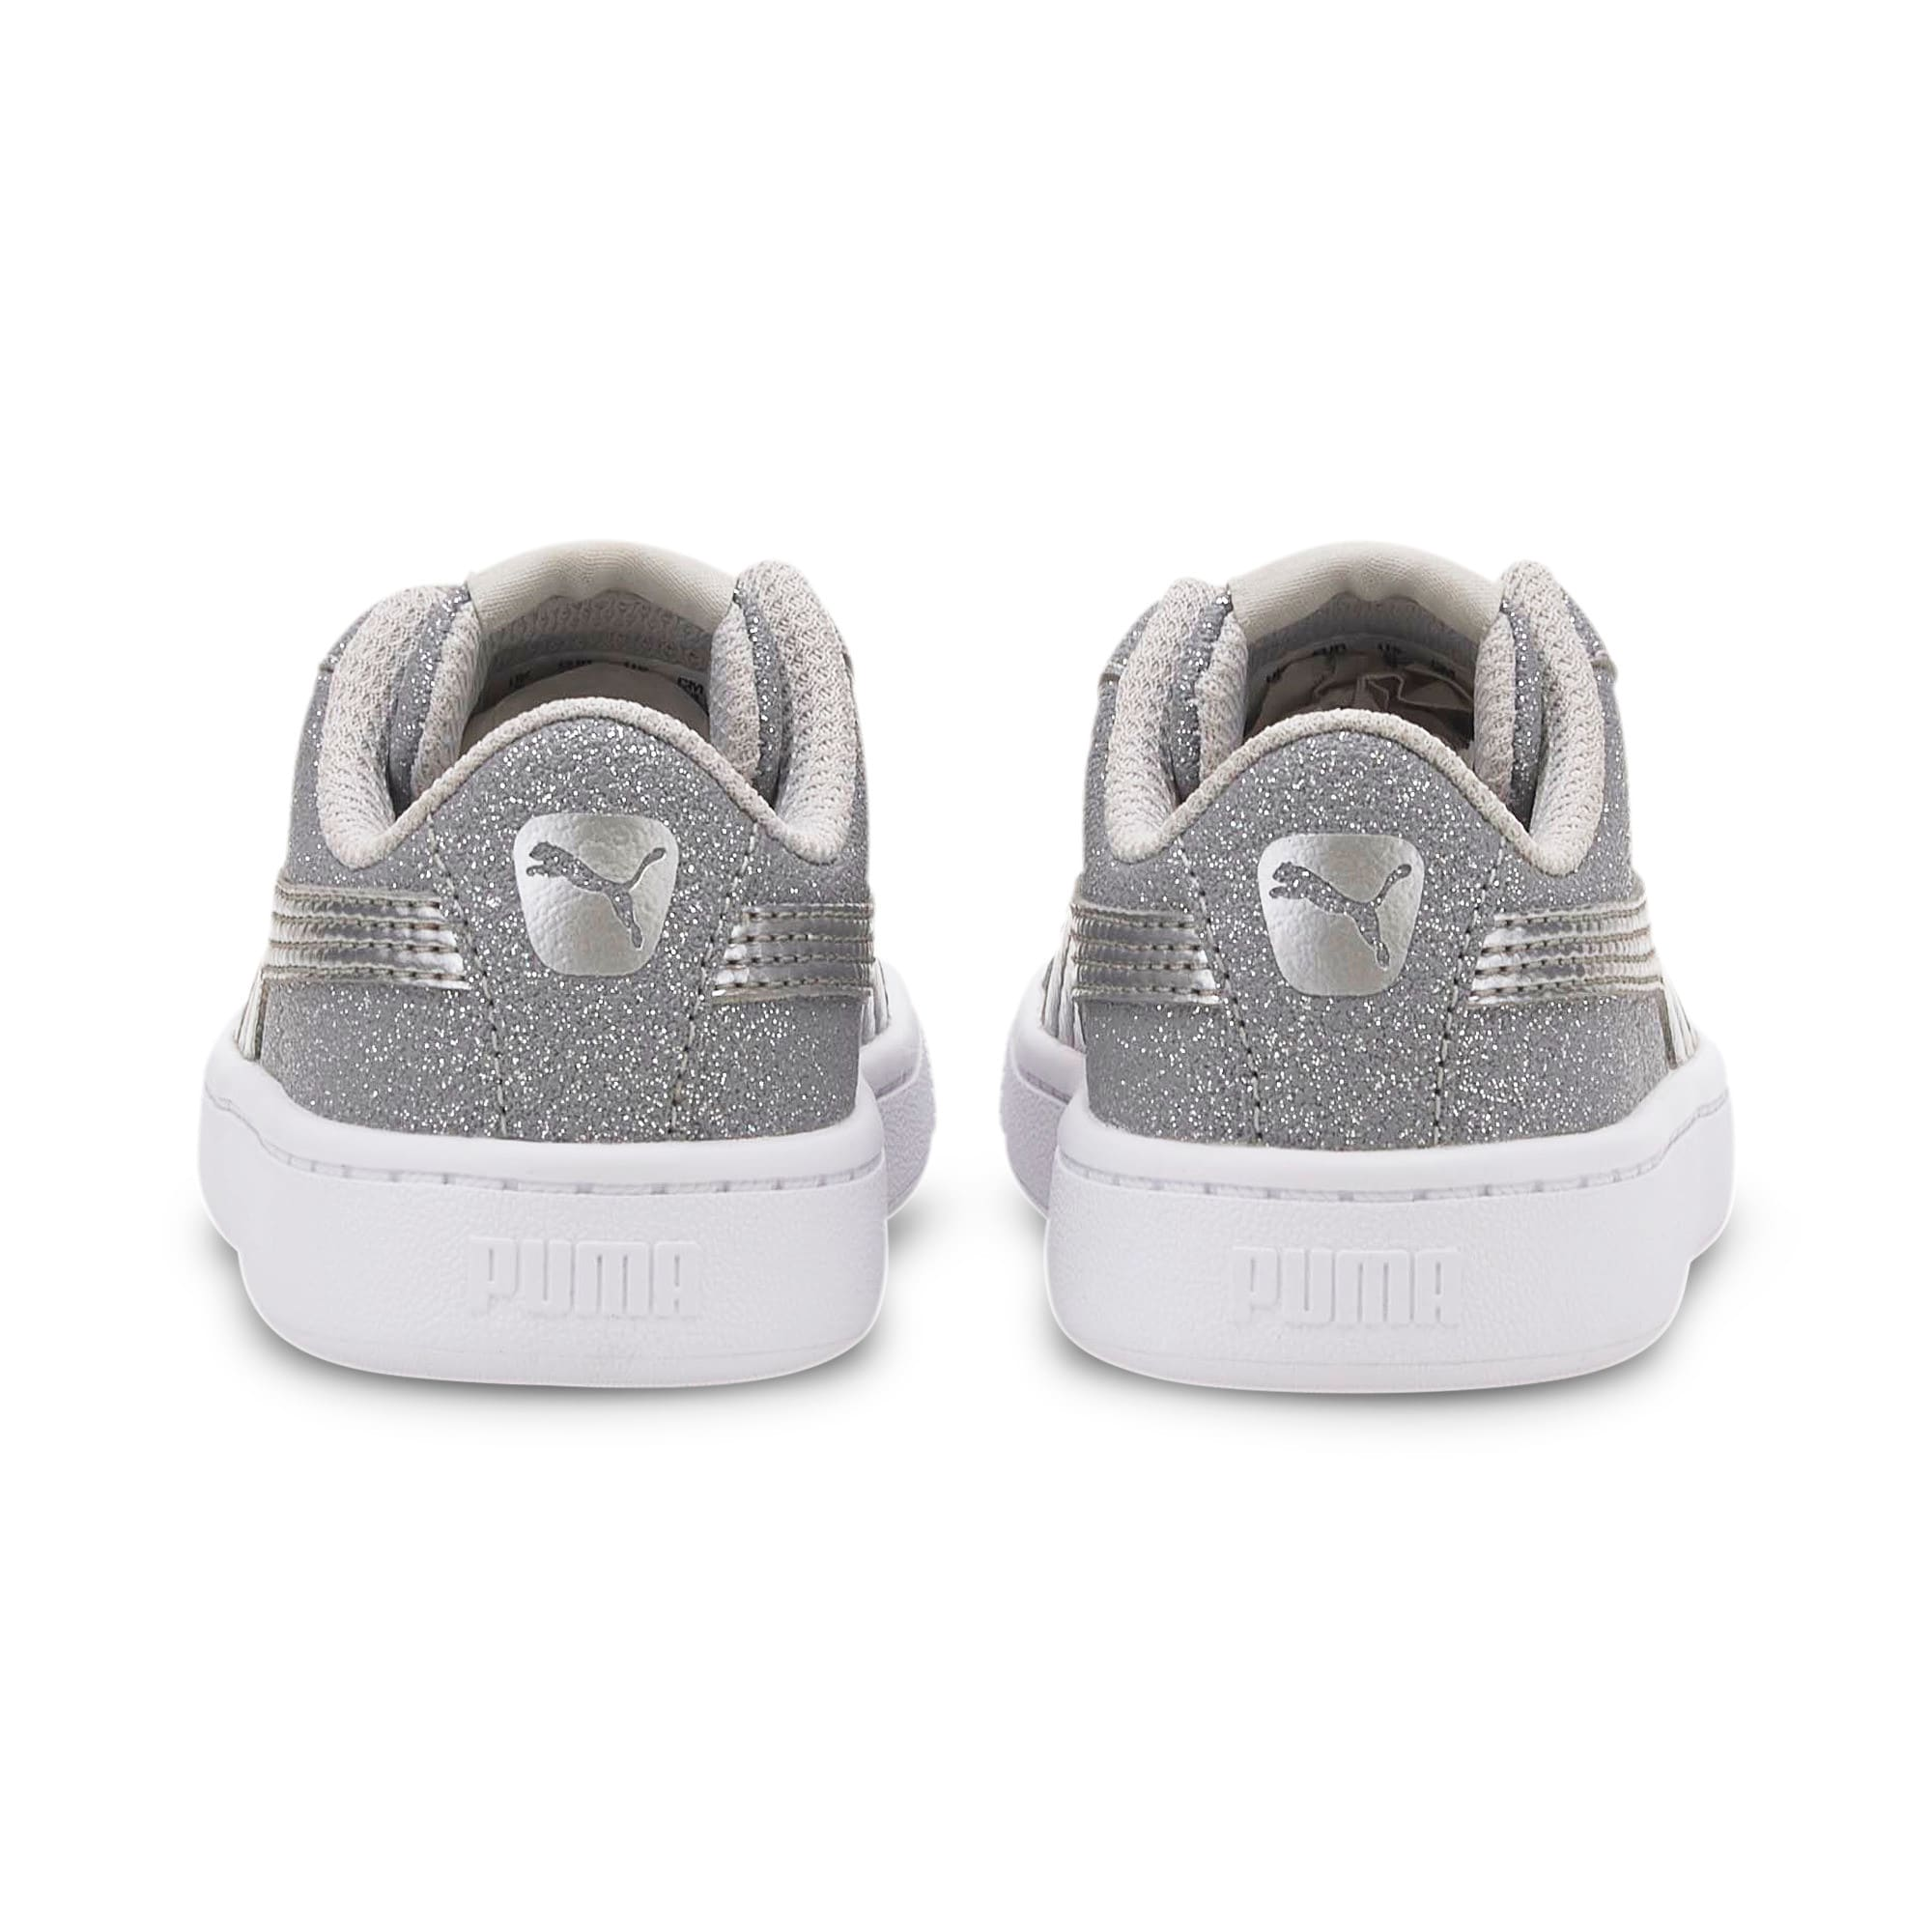 Thumbnail 3 of PUMA Vikky v2 Glitz AC Sneakers INF, Gray Violet-Silver-White, medium